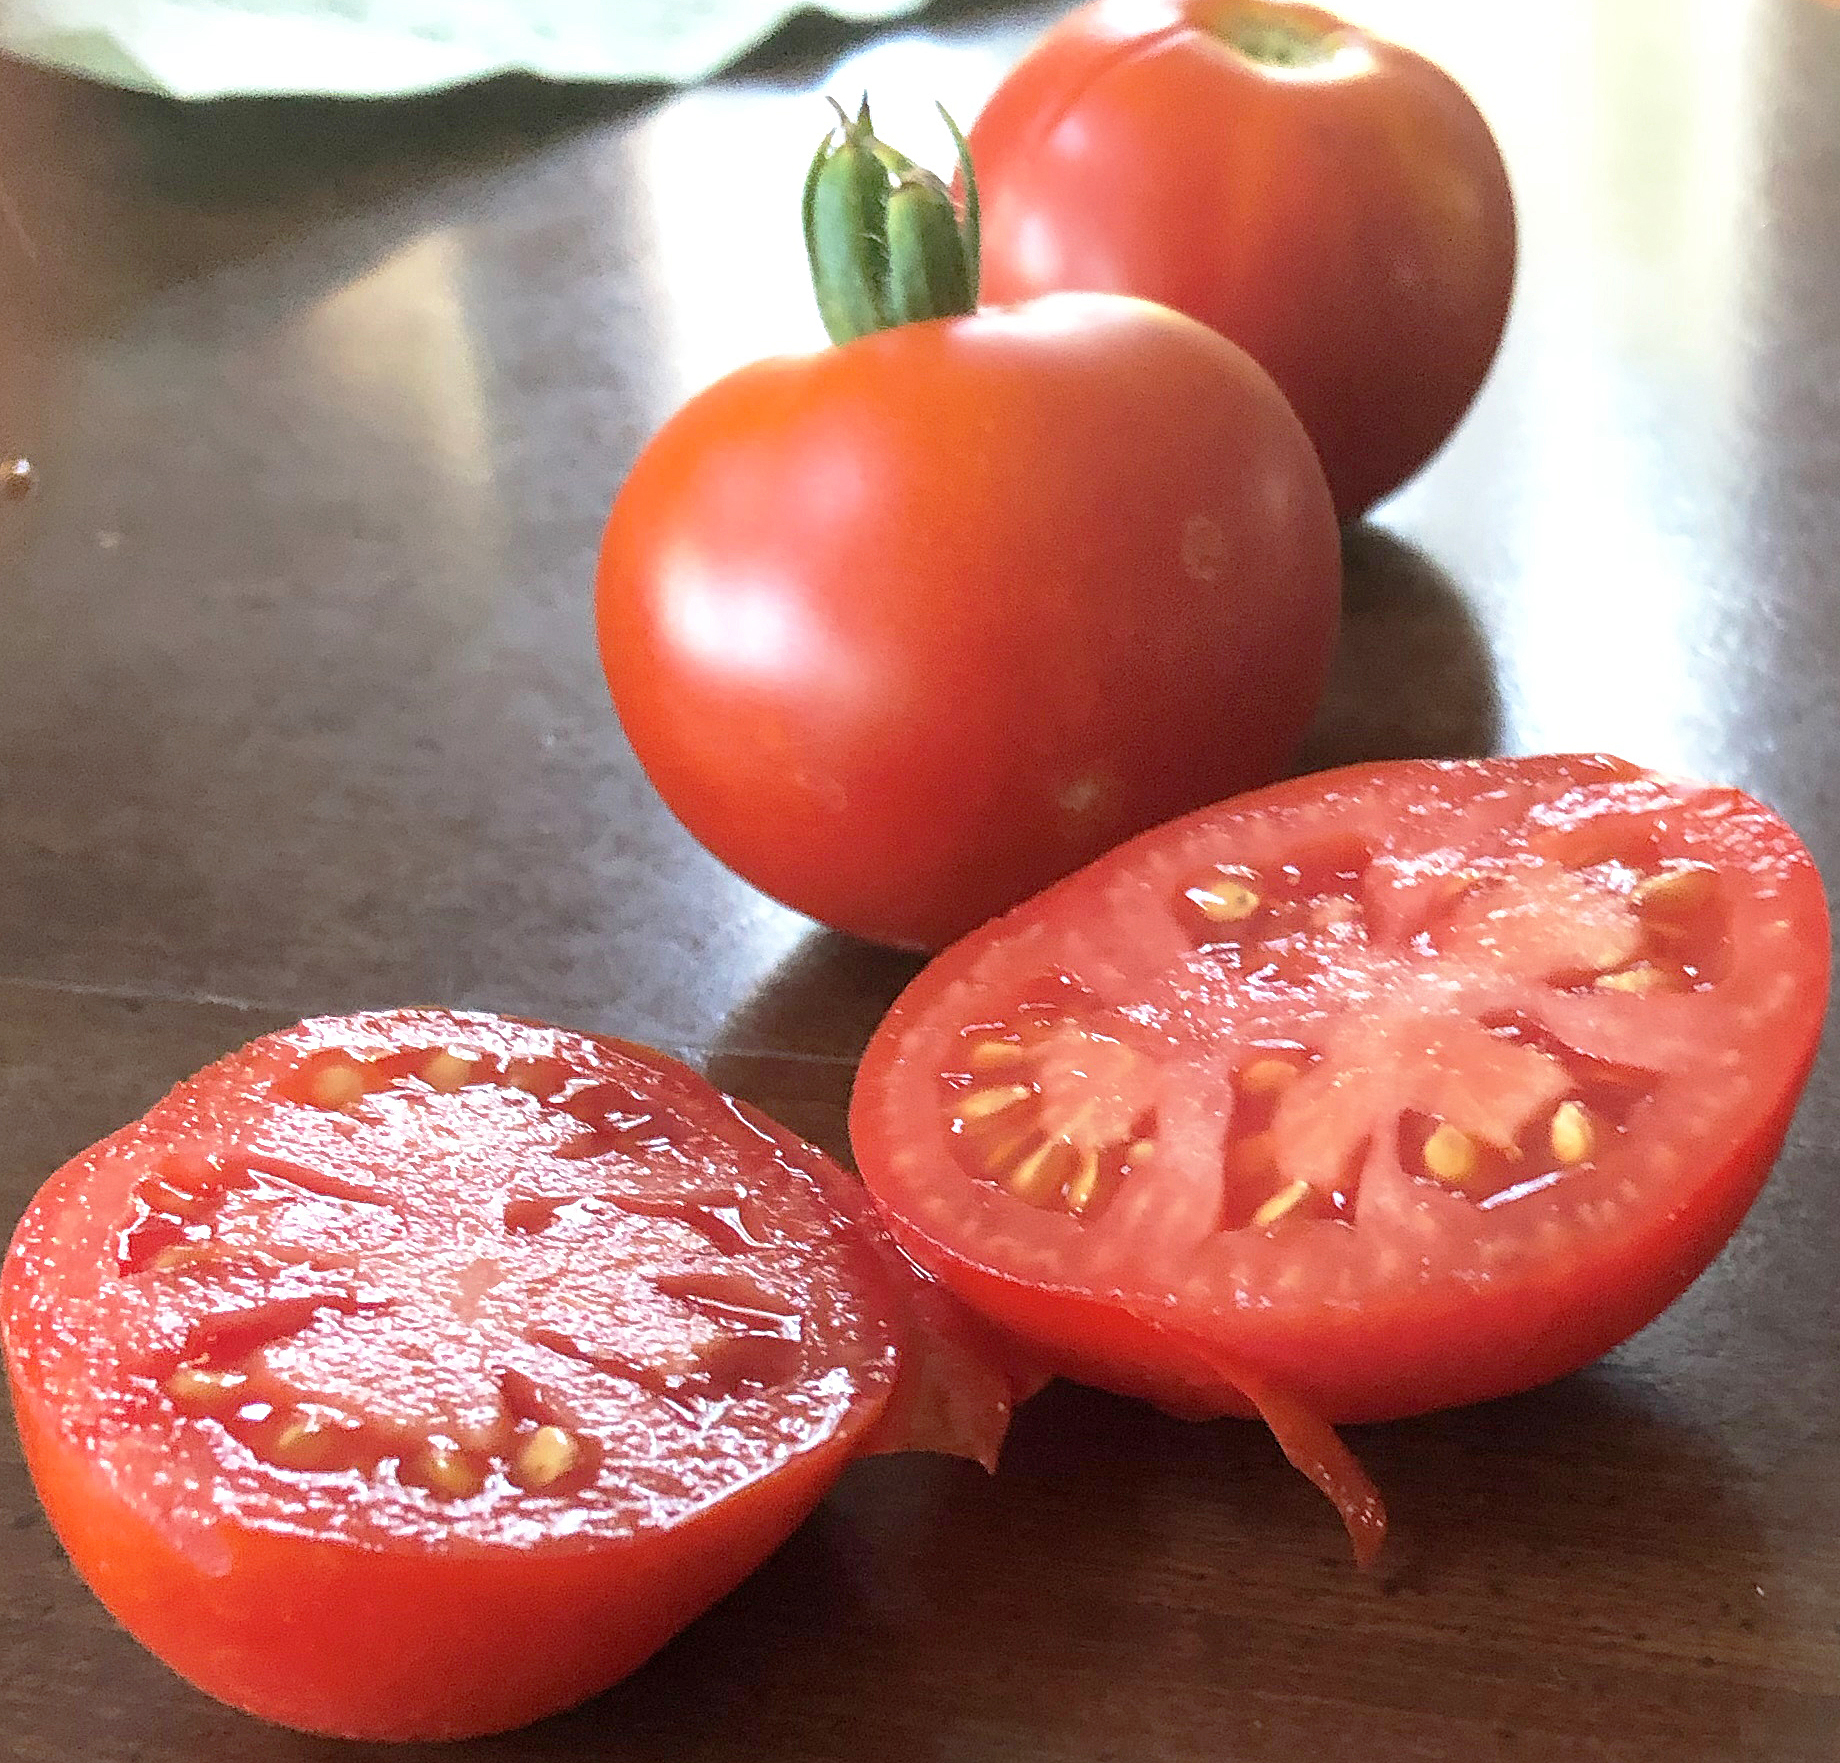 'German Extreme Dwarf Bush' tomatoes, grown by  Liz and Talus Piatkowski.